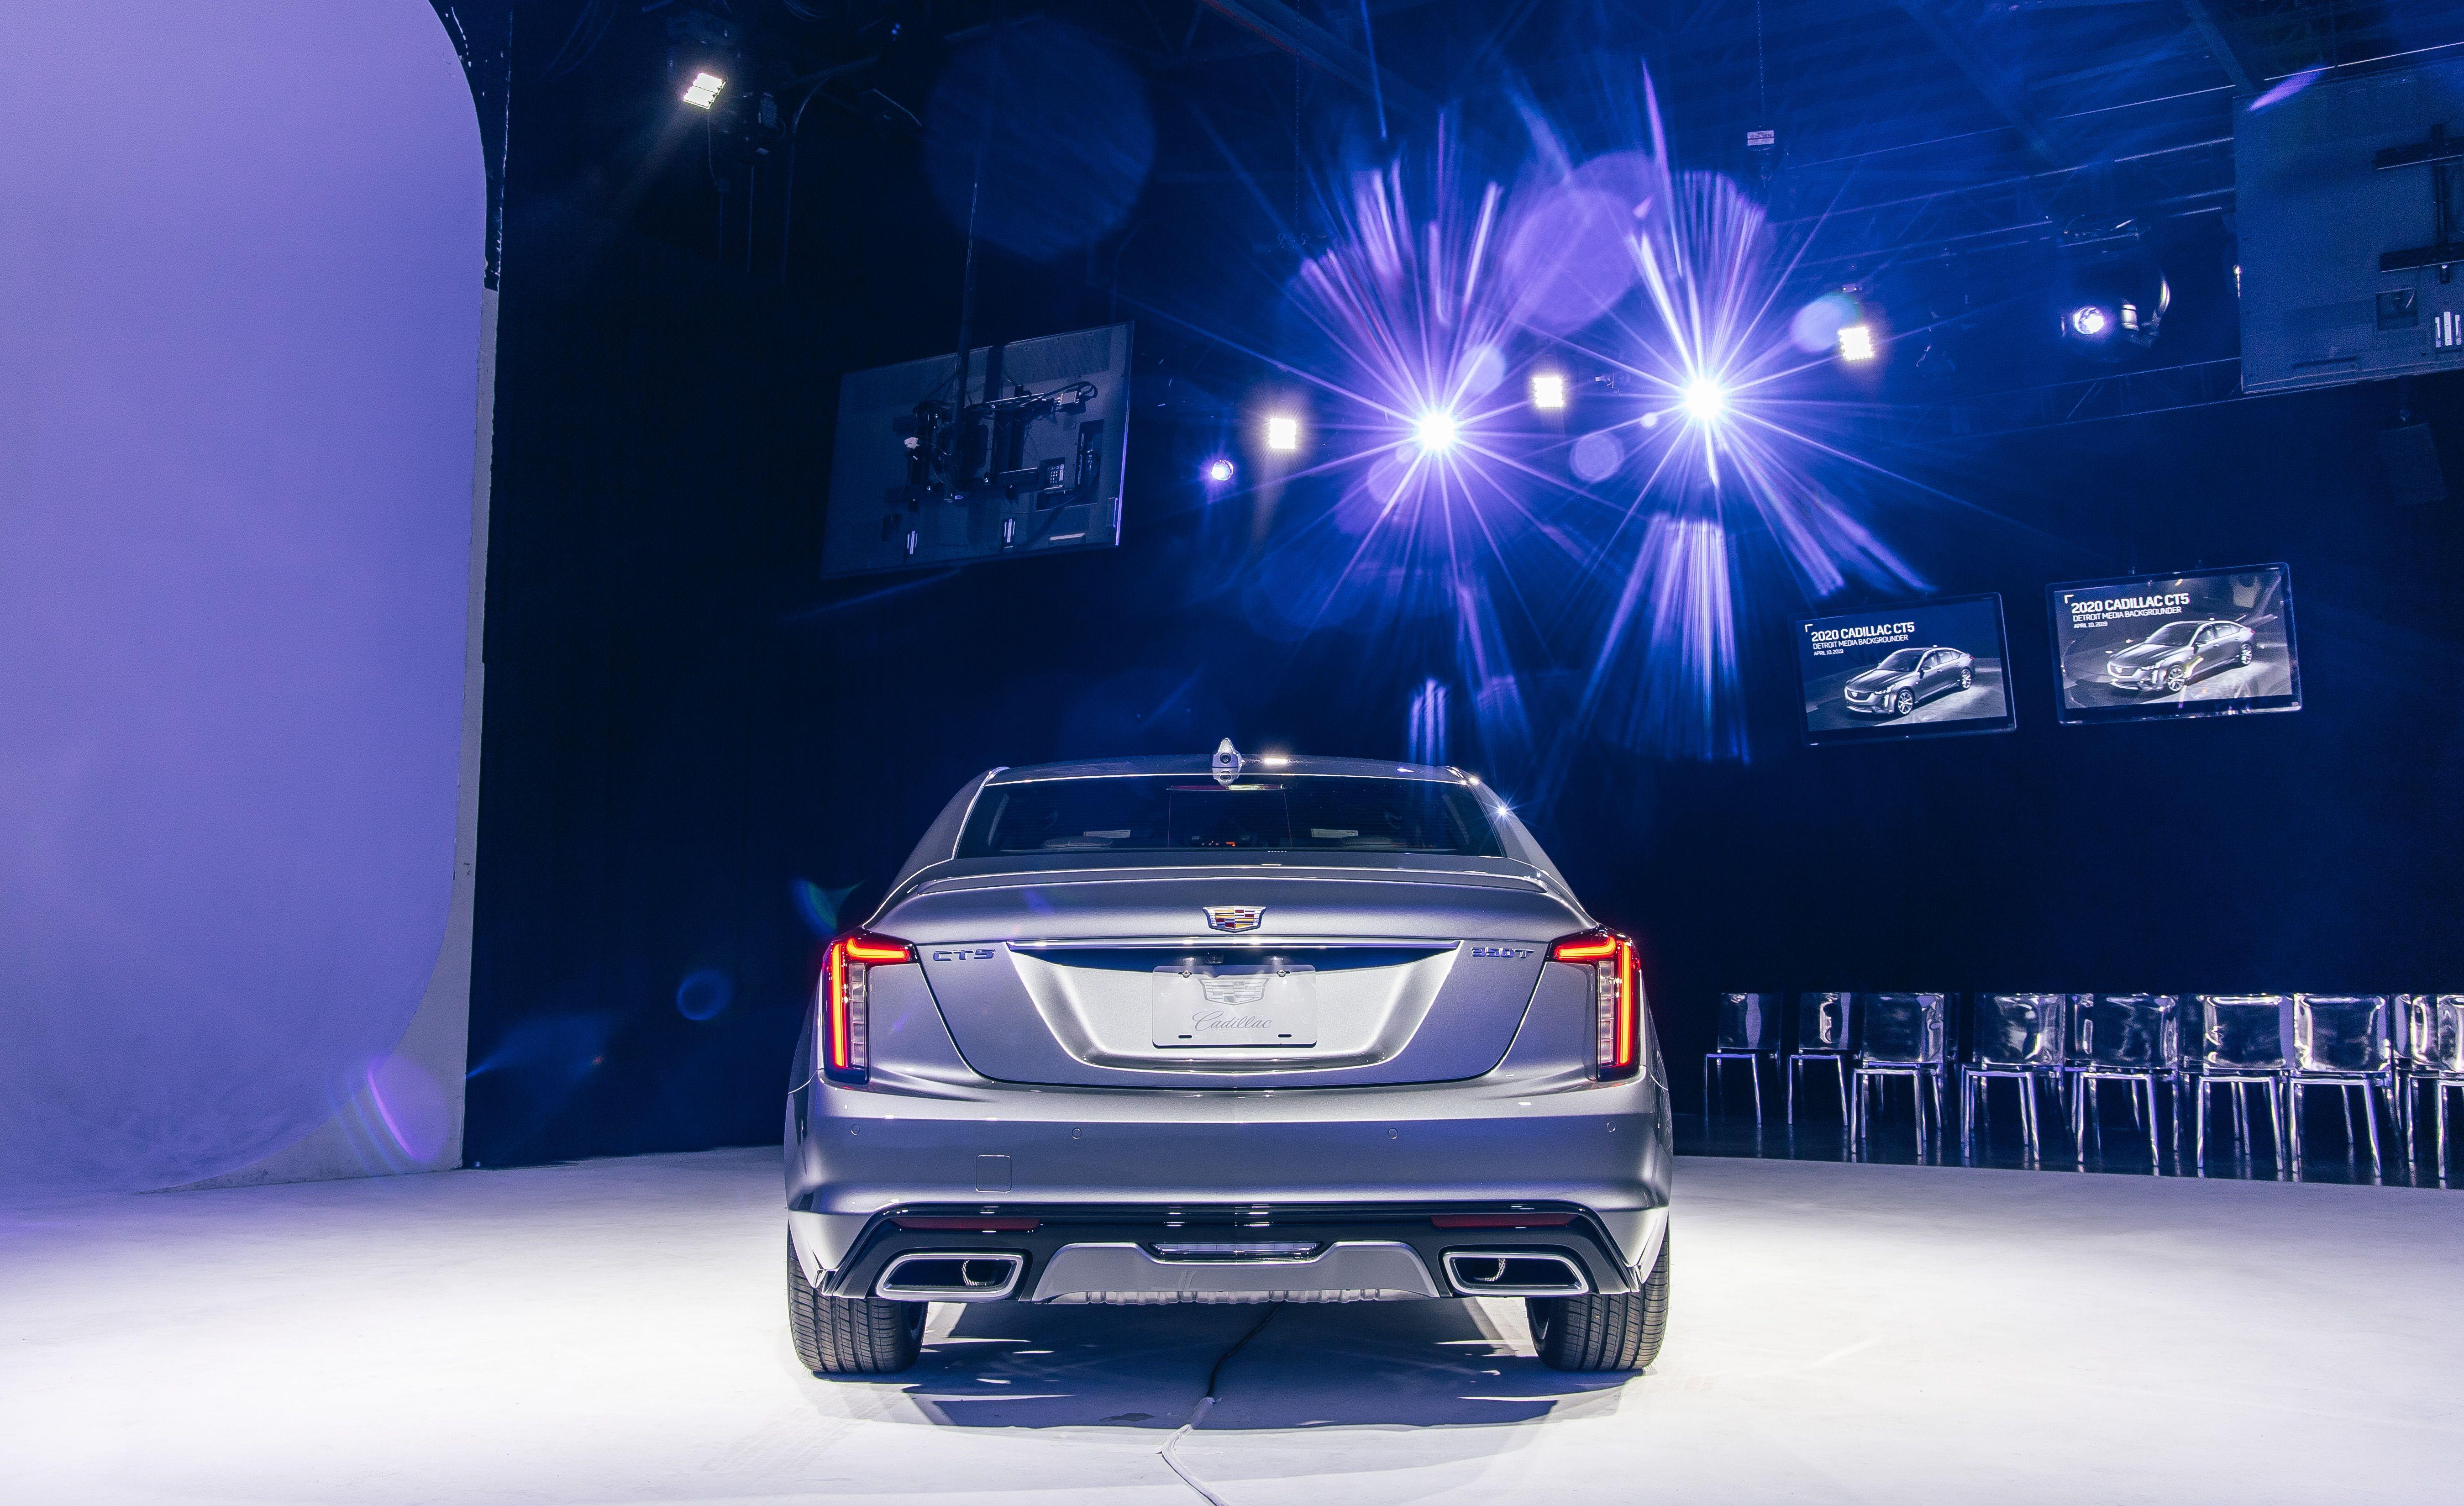 2020 Cadillac Ct5 Reviews Cadillac Ct5 Price Photos And Specs